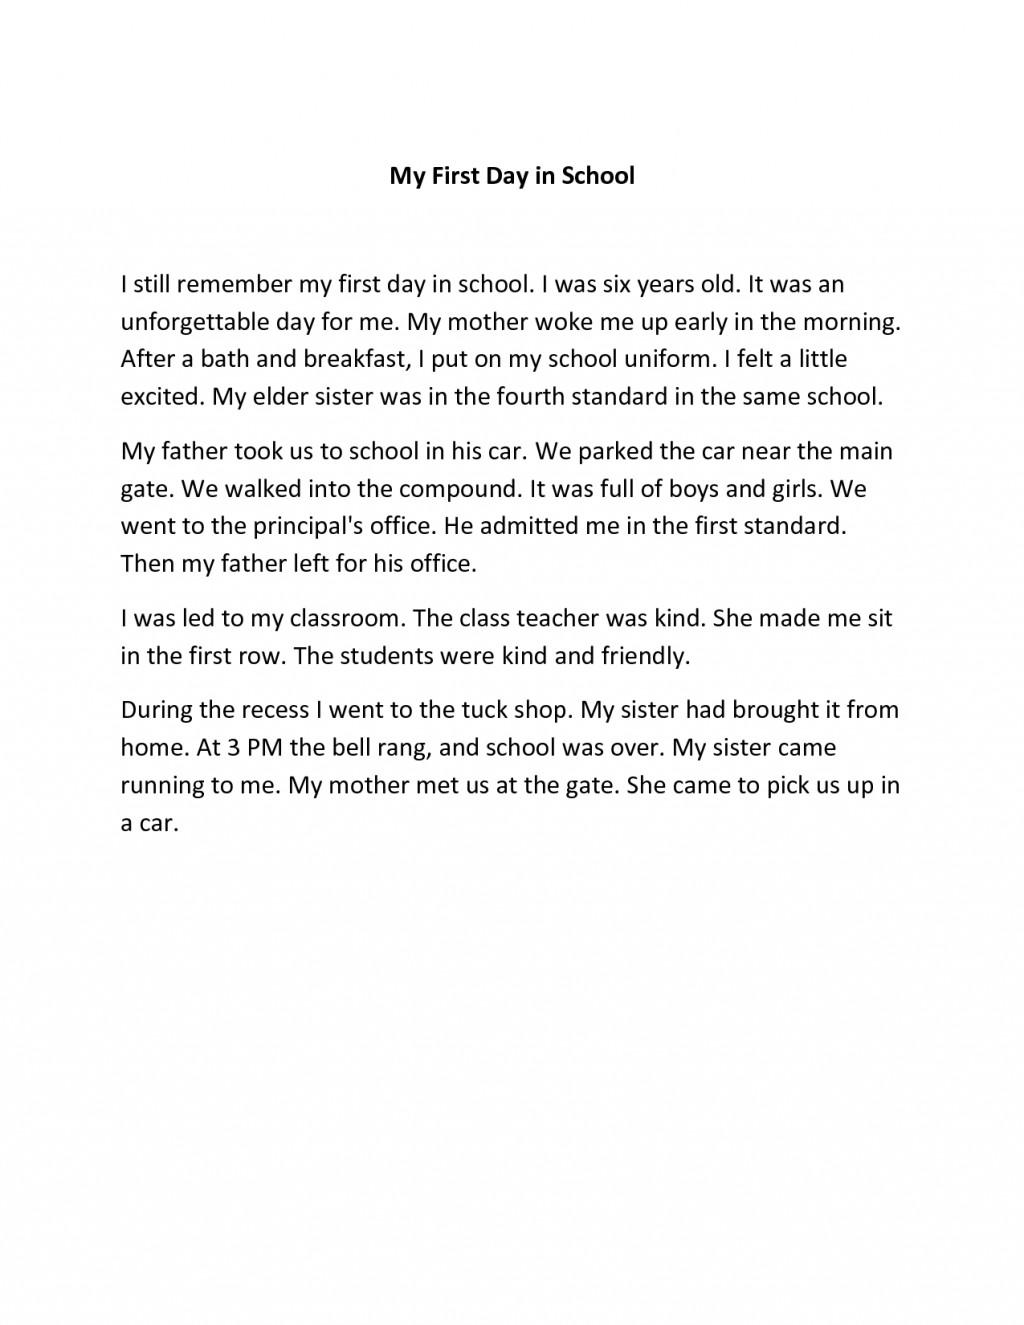 007 My School Essay Example Amazing Dream For Class 10 In Urdu 1 3 Marathi Large